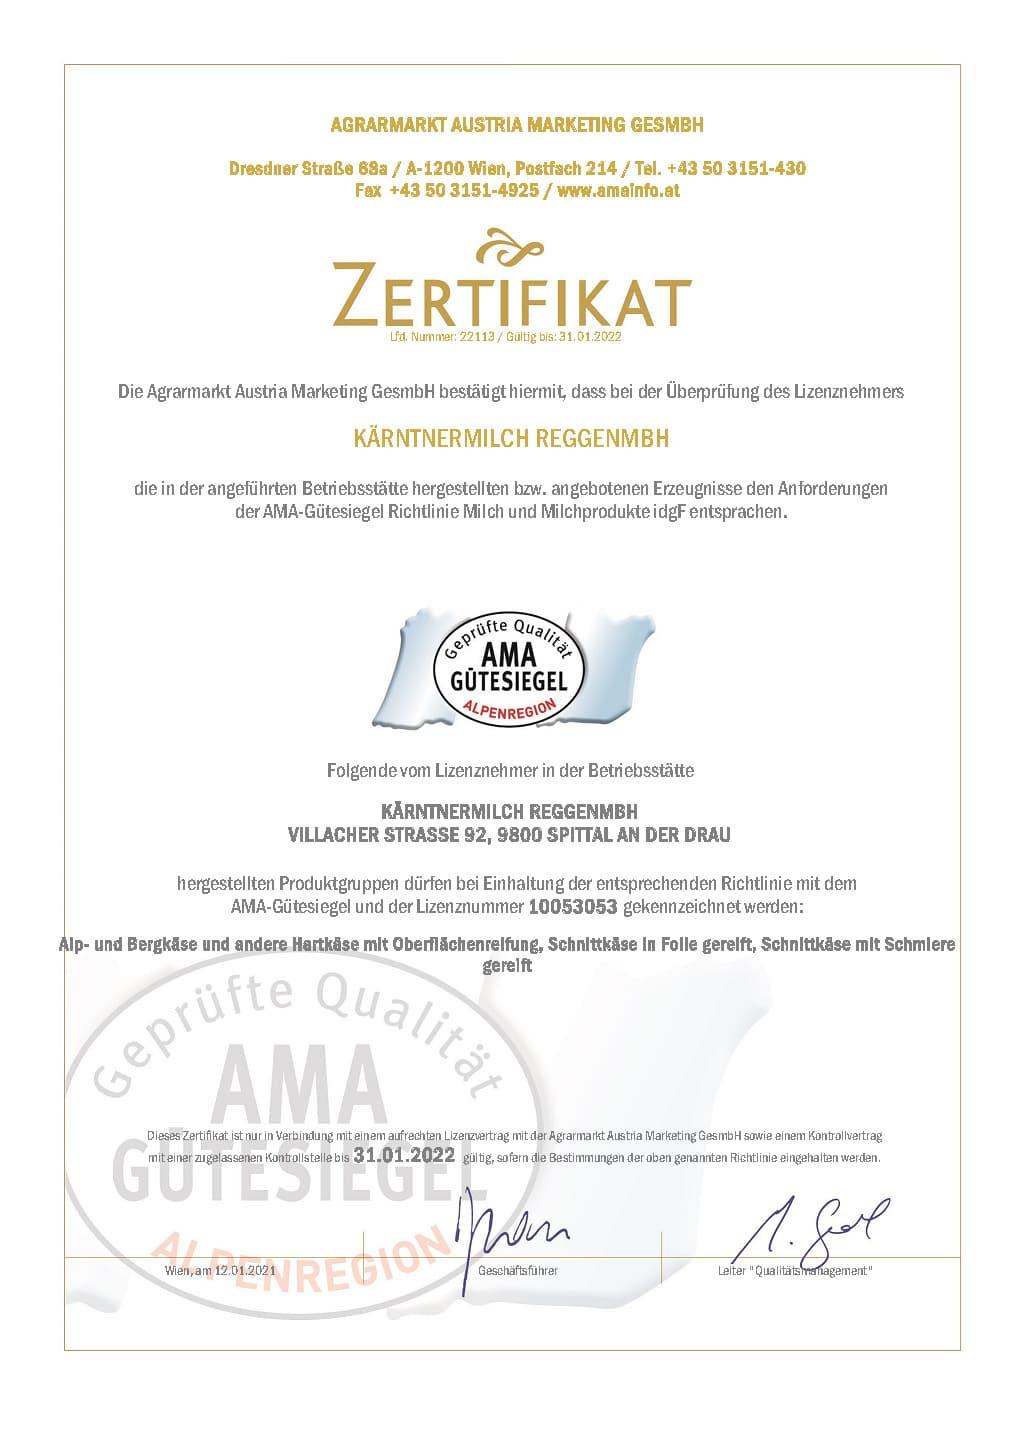 ama-alpenregion-kaerntnermilch-reggengmbh-zertifikat